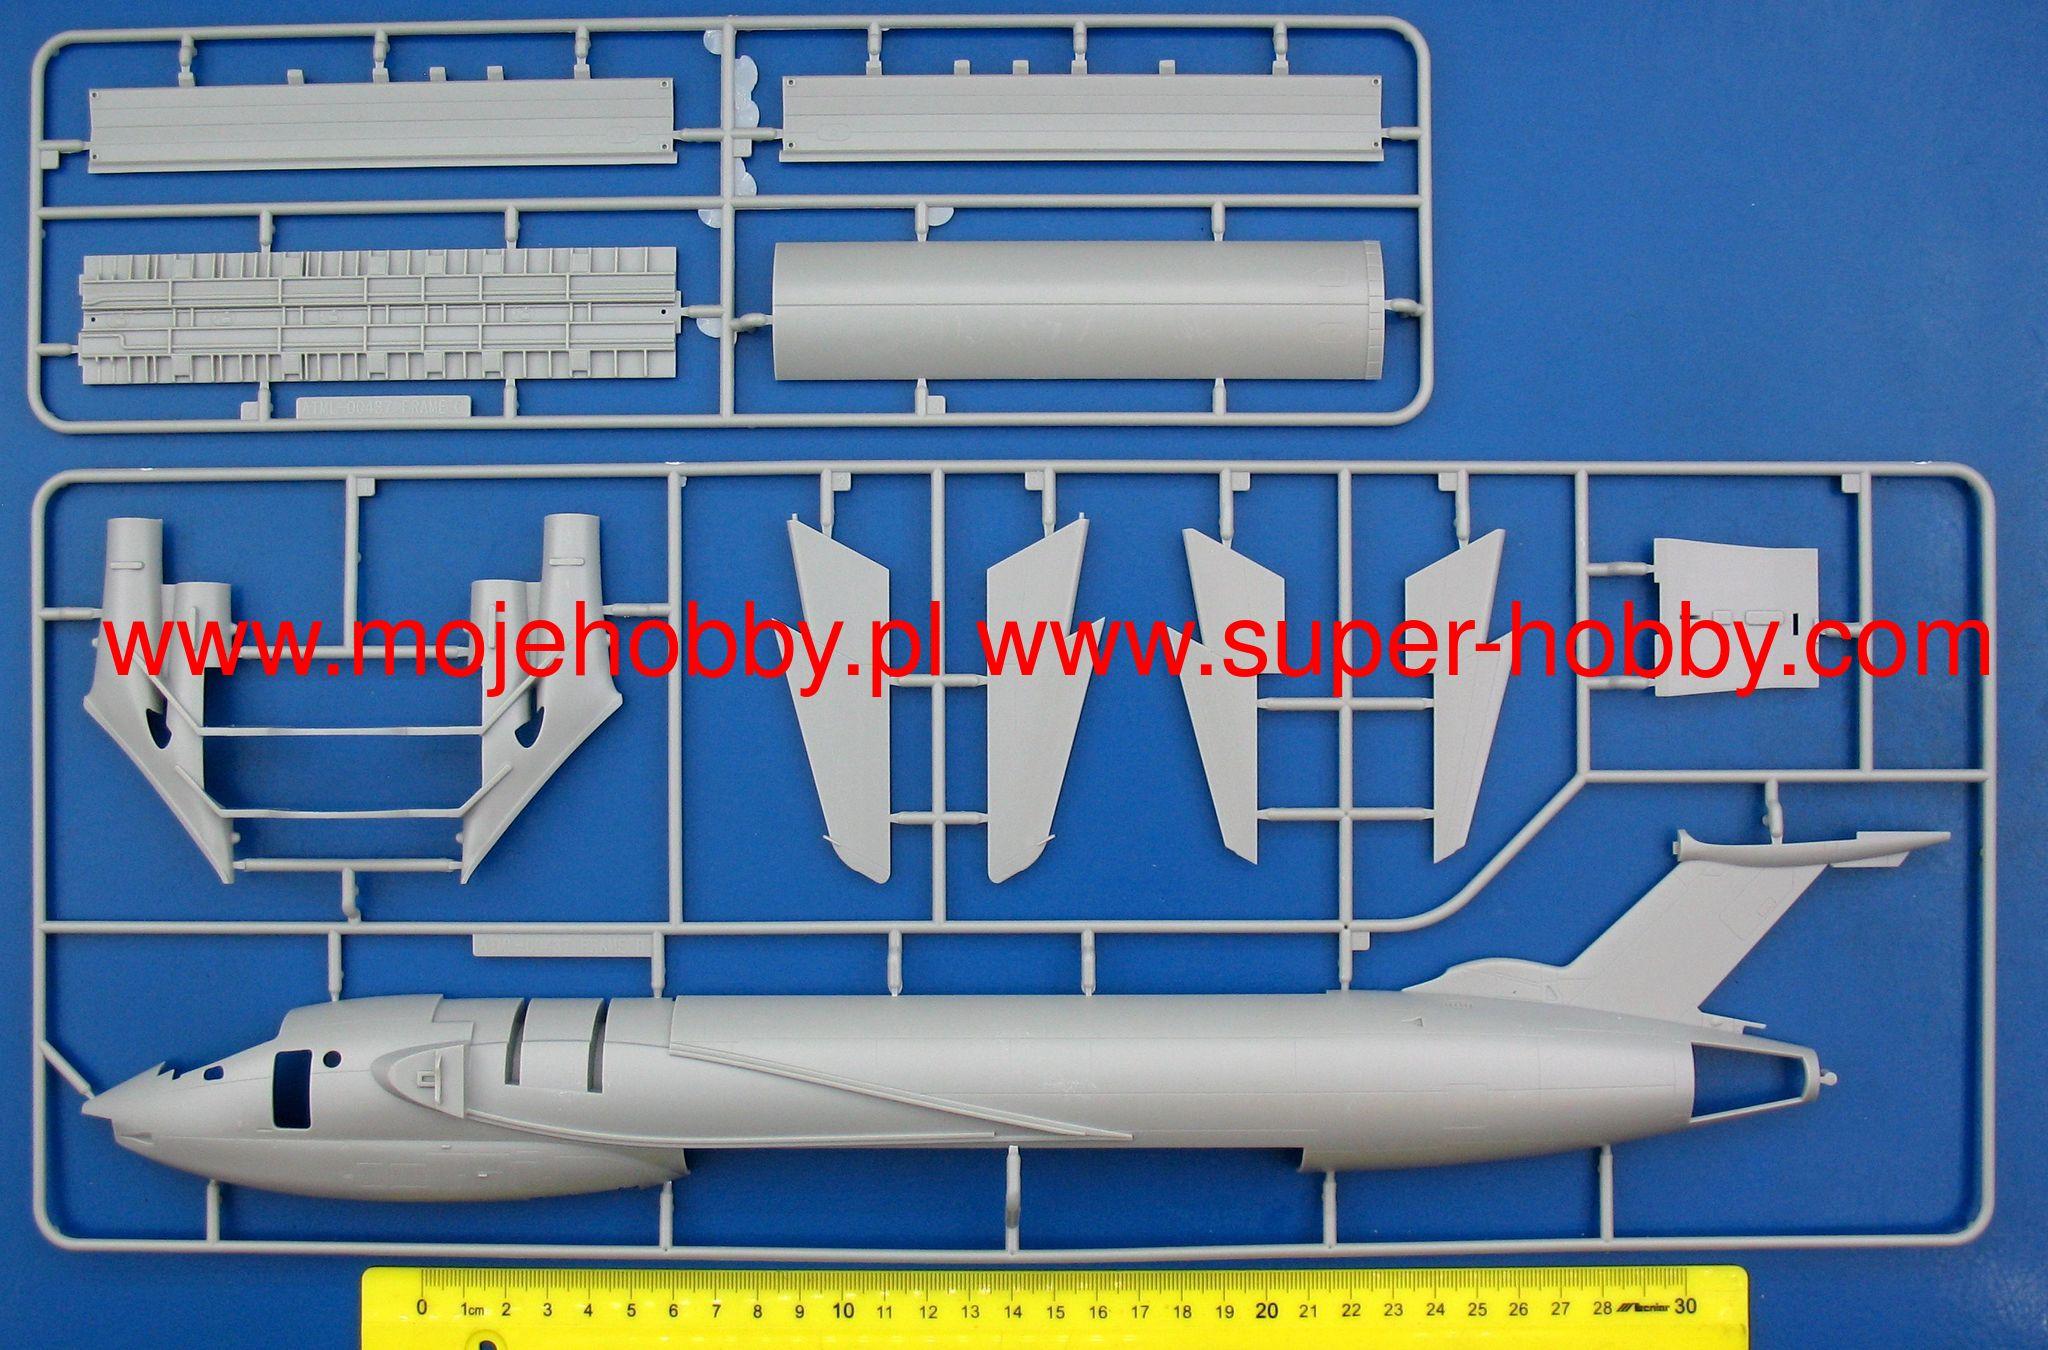 LEGO 3475a LIGHT GREY x1 AC5 Smooth Small ENGINE 1 x 2 Side Plate no Axle